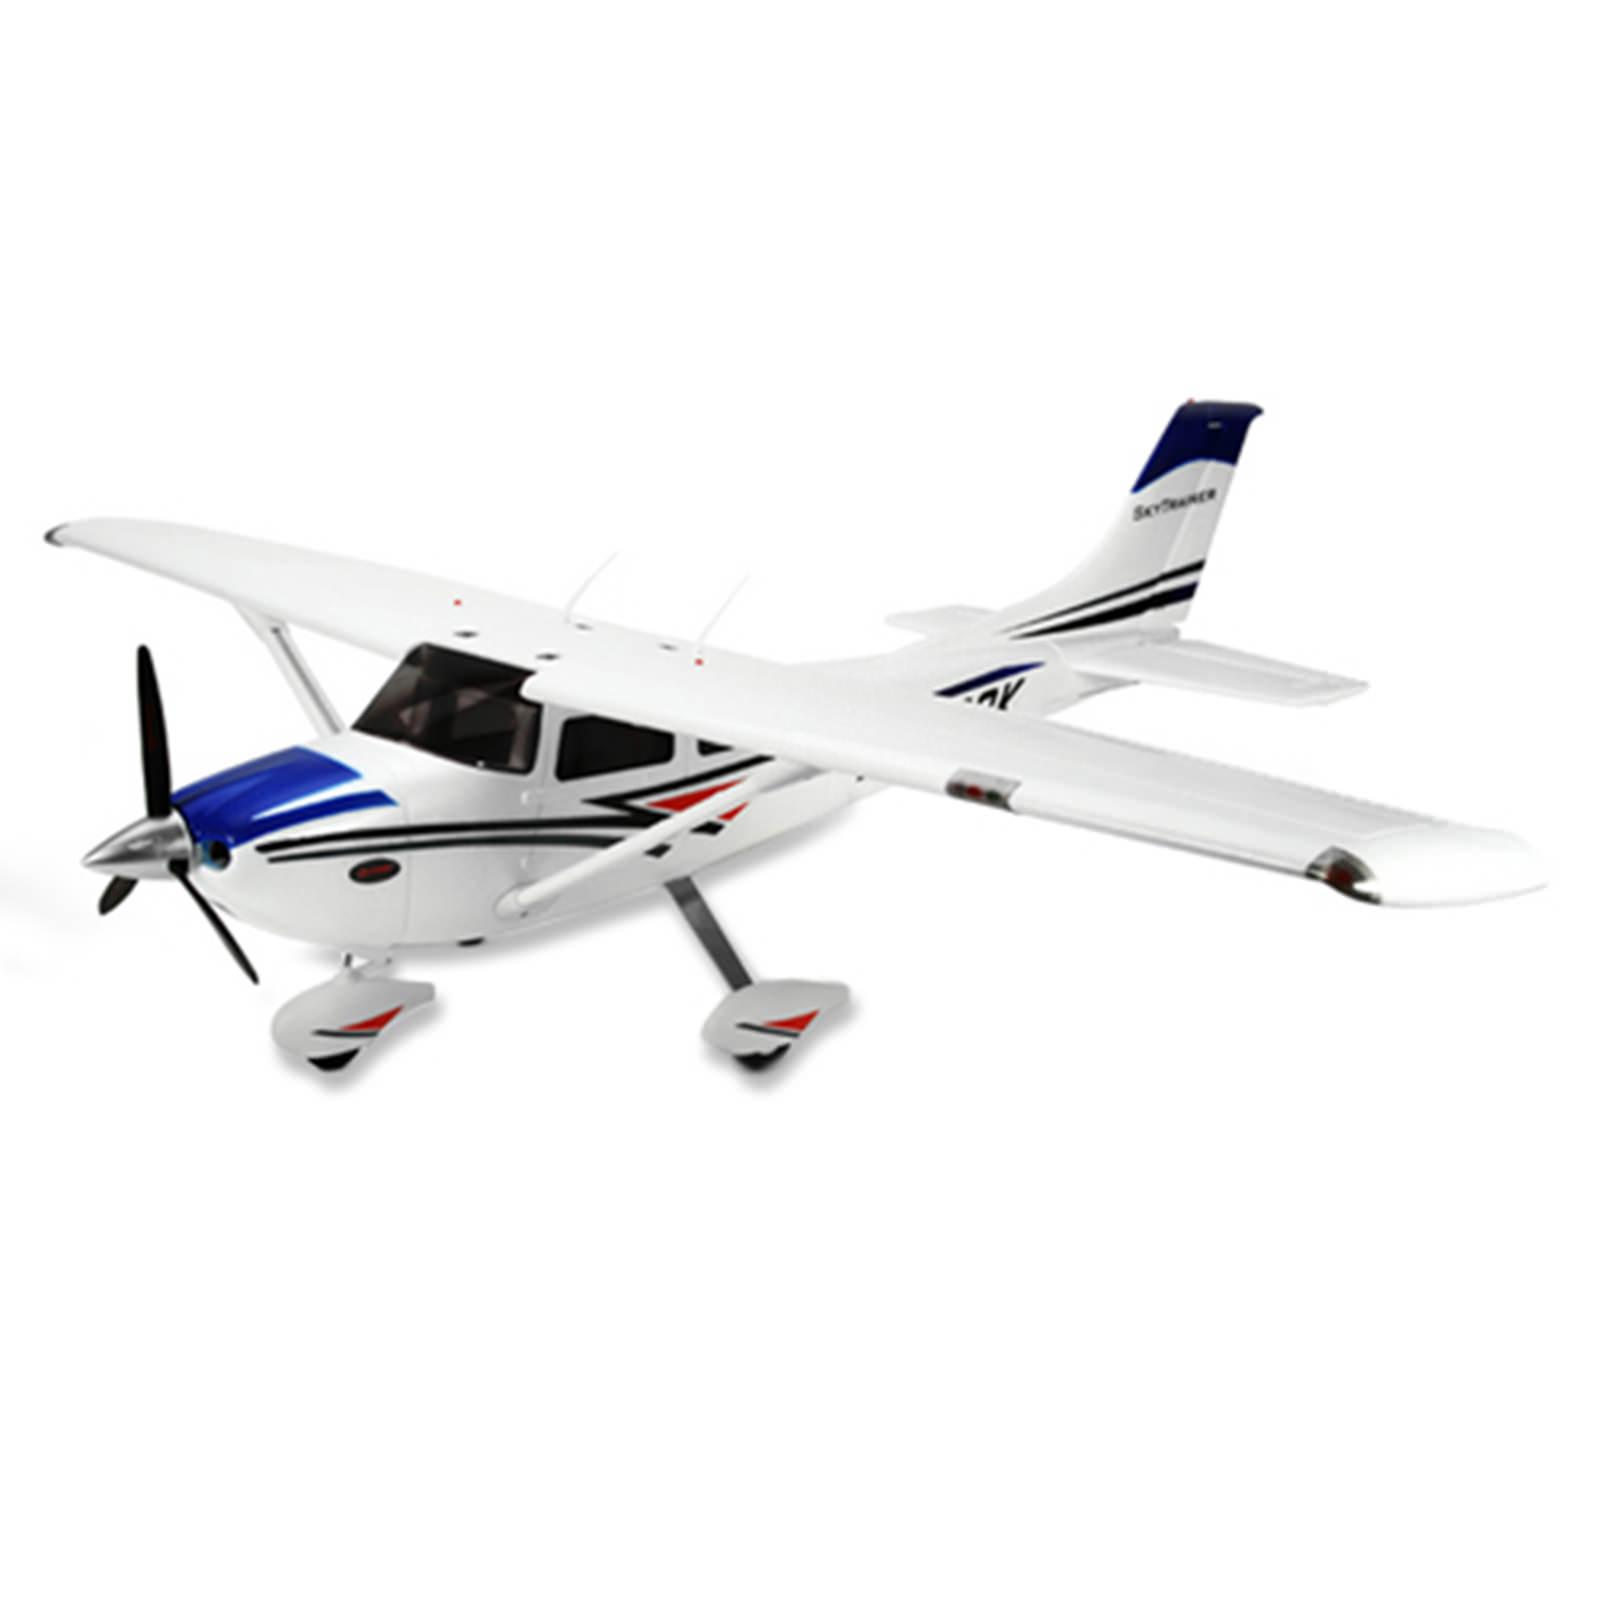 Dynam 8938 Cessna 182 Rc Plane At Hobby Warehouse